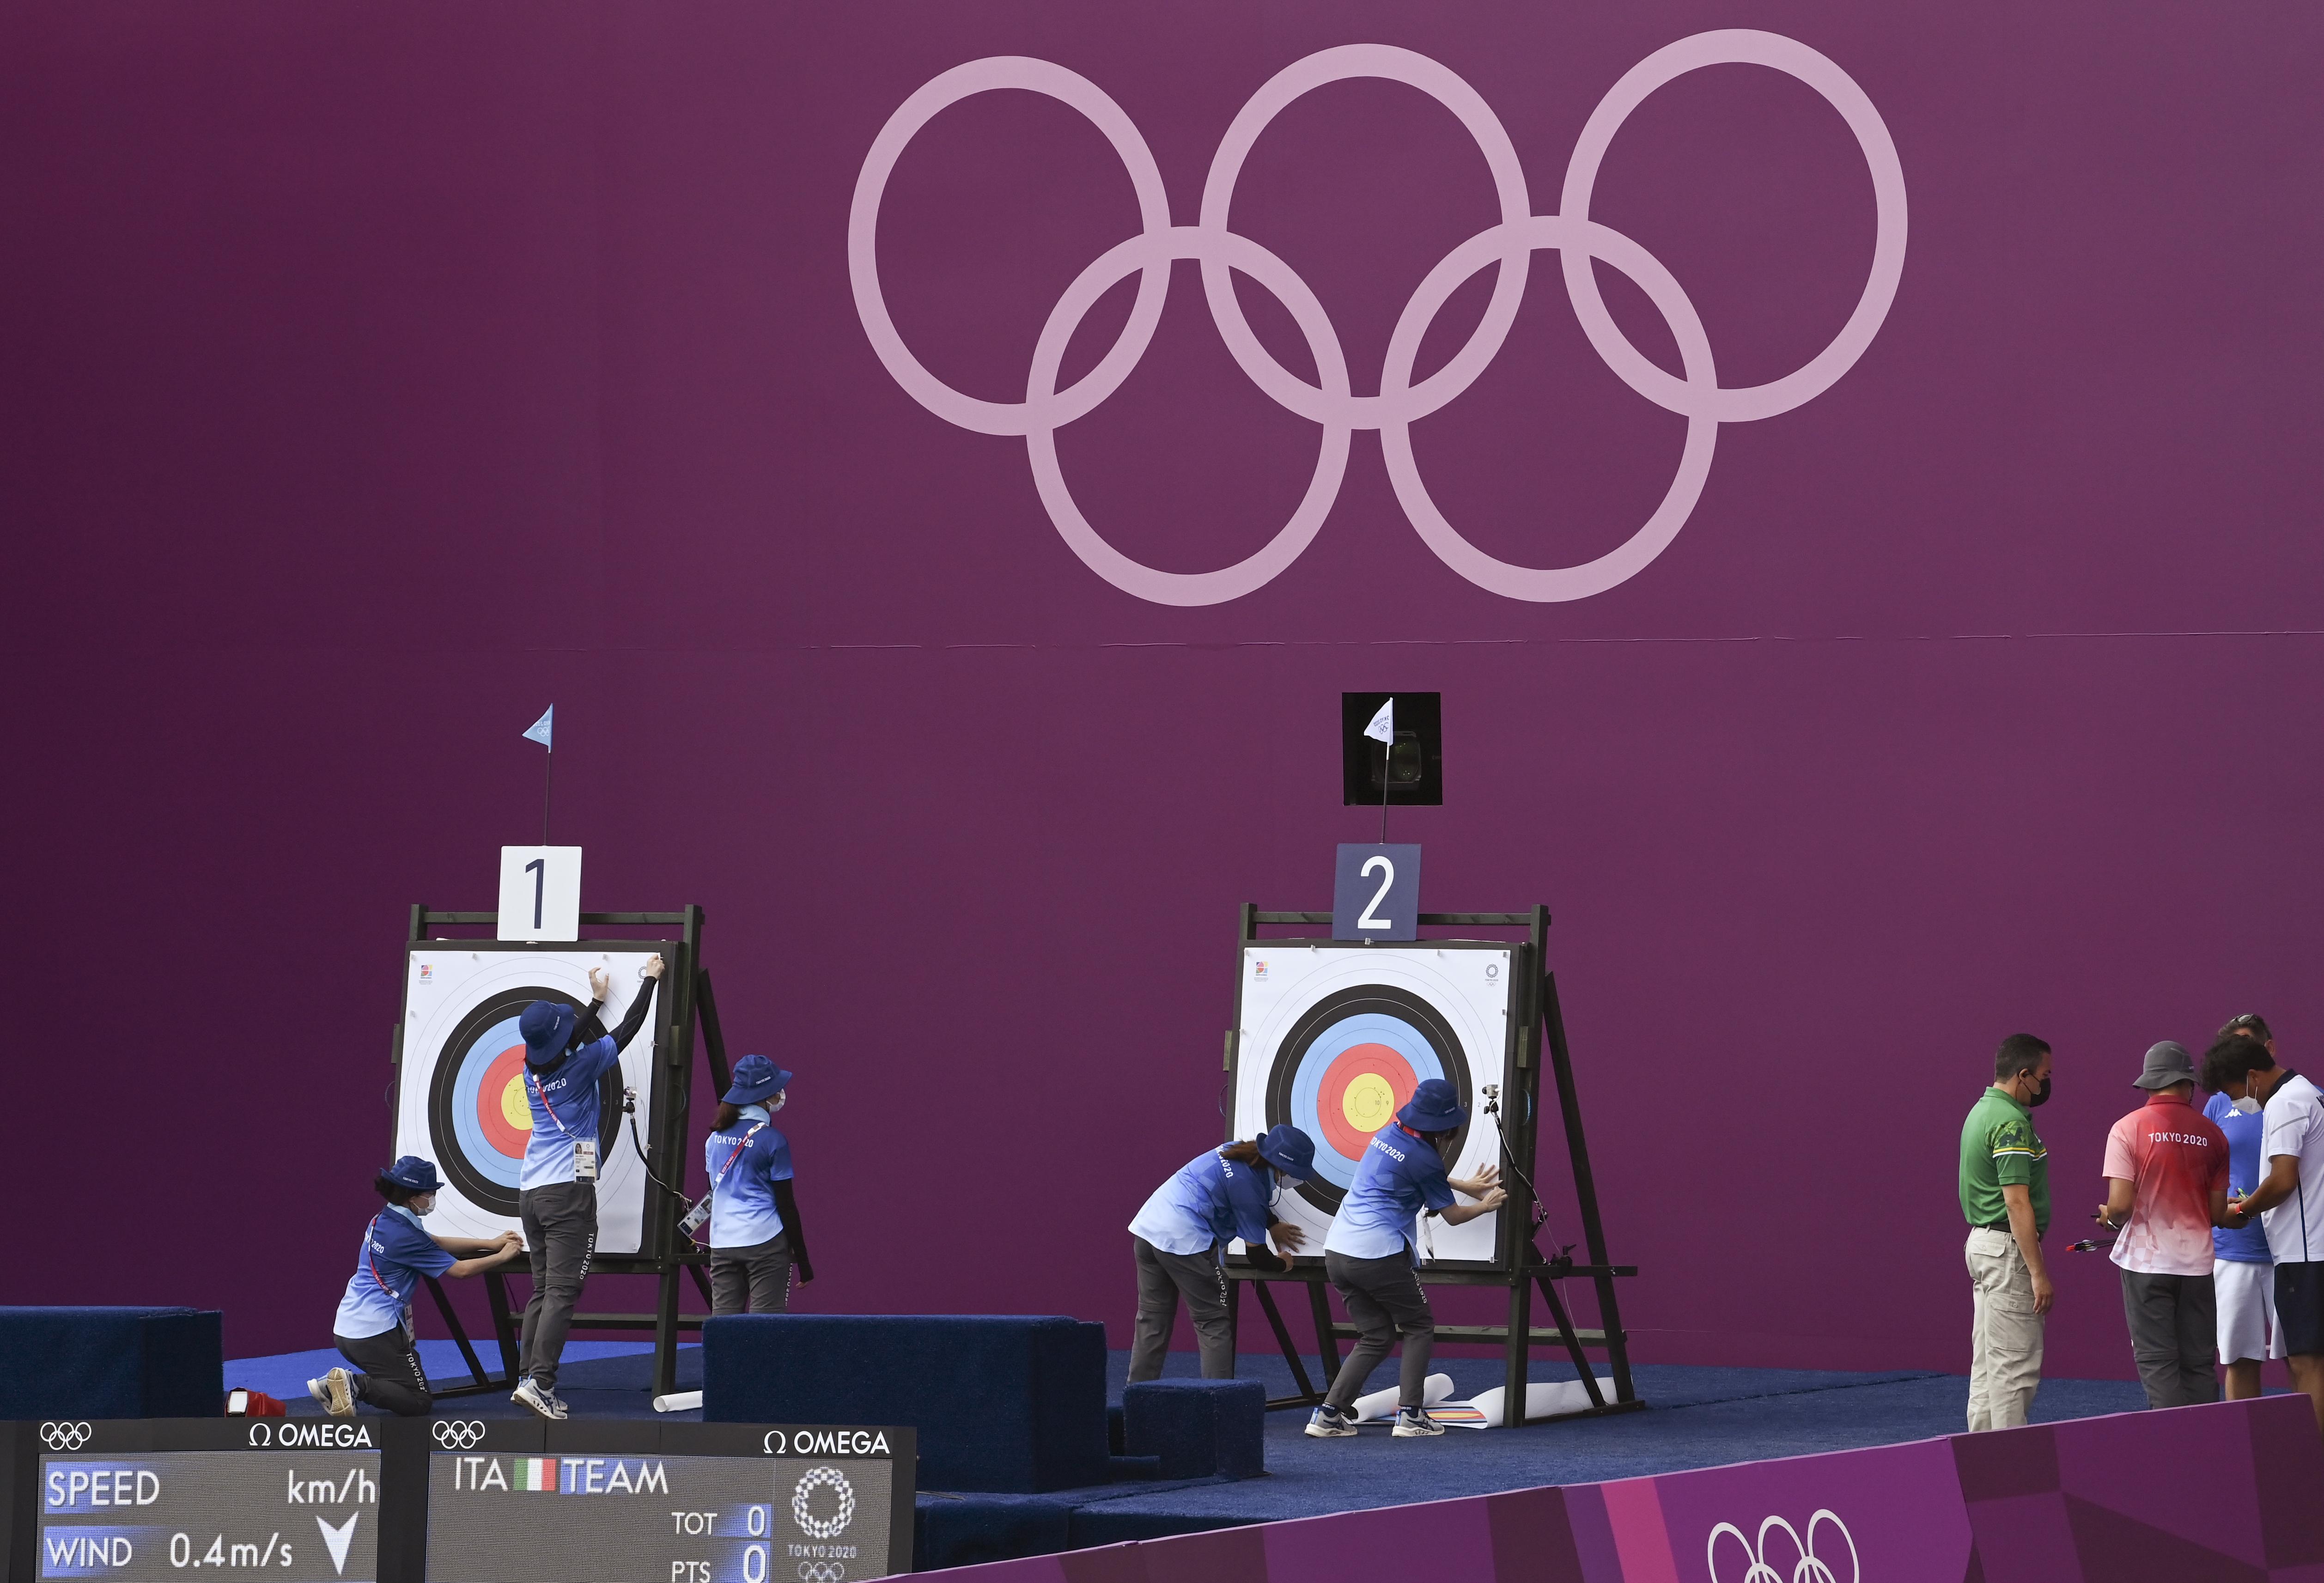 Tokyo 2020 Olympics - Archery - Women's Team - Quarterfinals - Yumenoshima Archery Field, Tokyo, Japan - July 25, 2021. Volunteers prepare targets REUTERS/Clodagh Kilcoyne